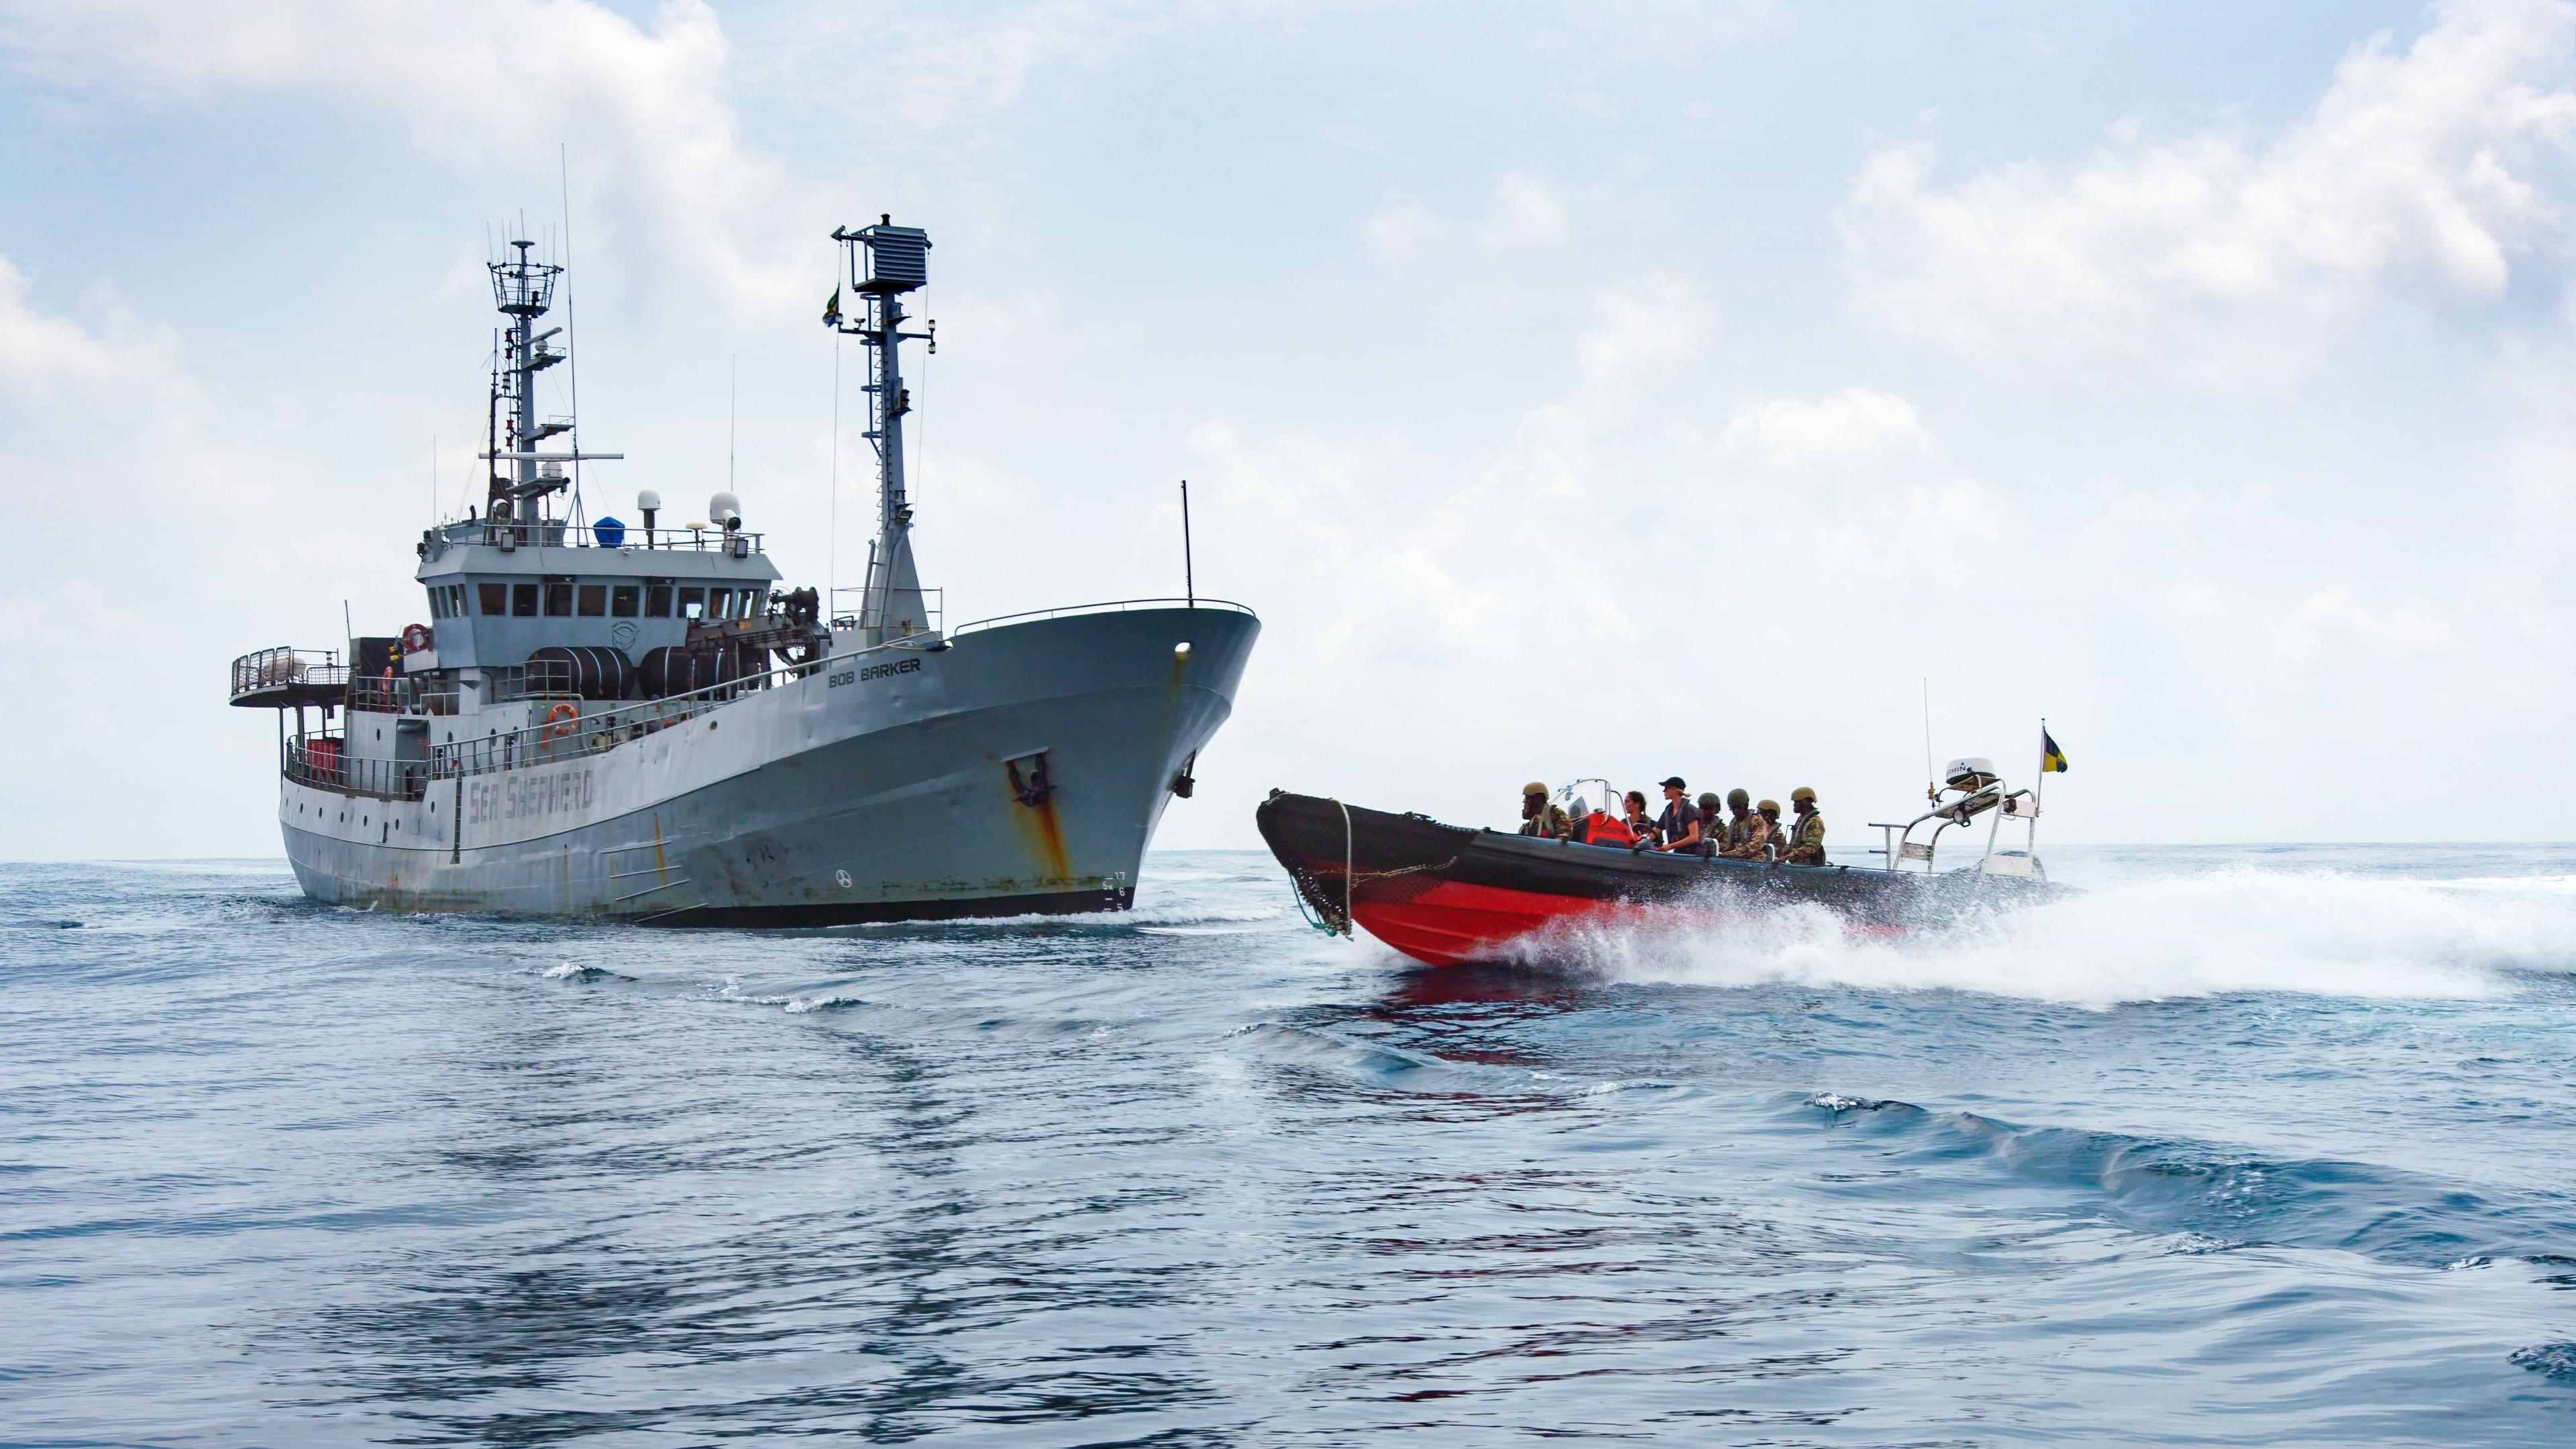 Sea shepherd apprehending ship